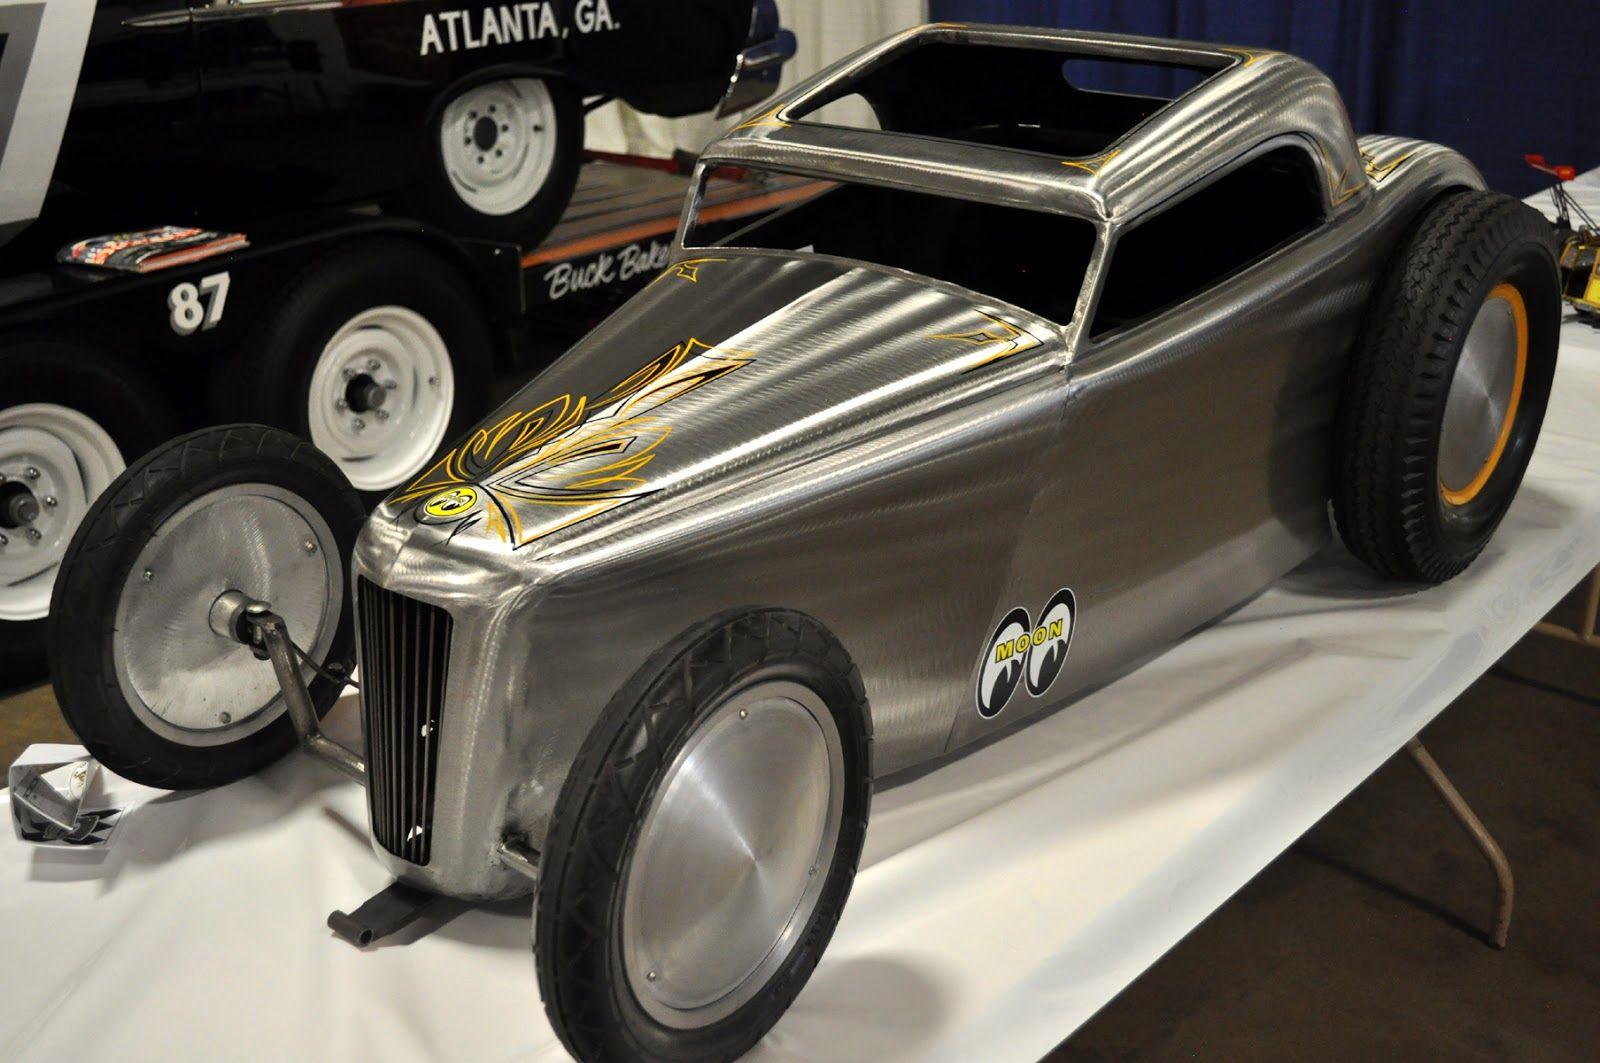 1940 Ford Roadster Pedal Car Pesquisa Google Things